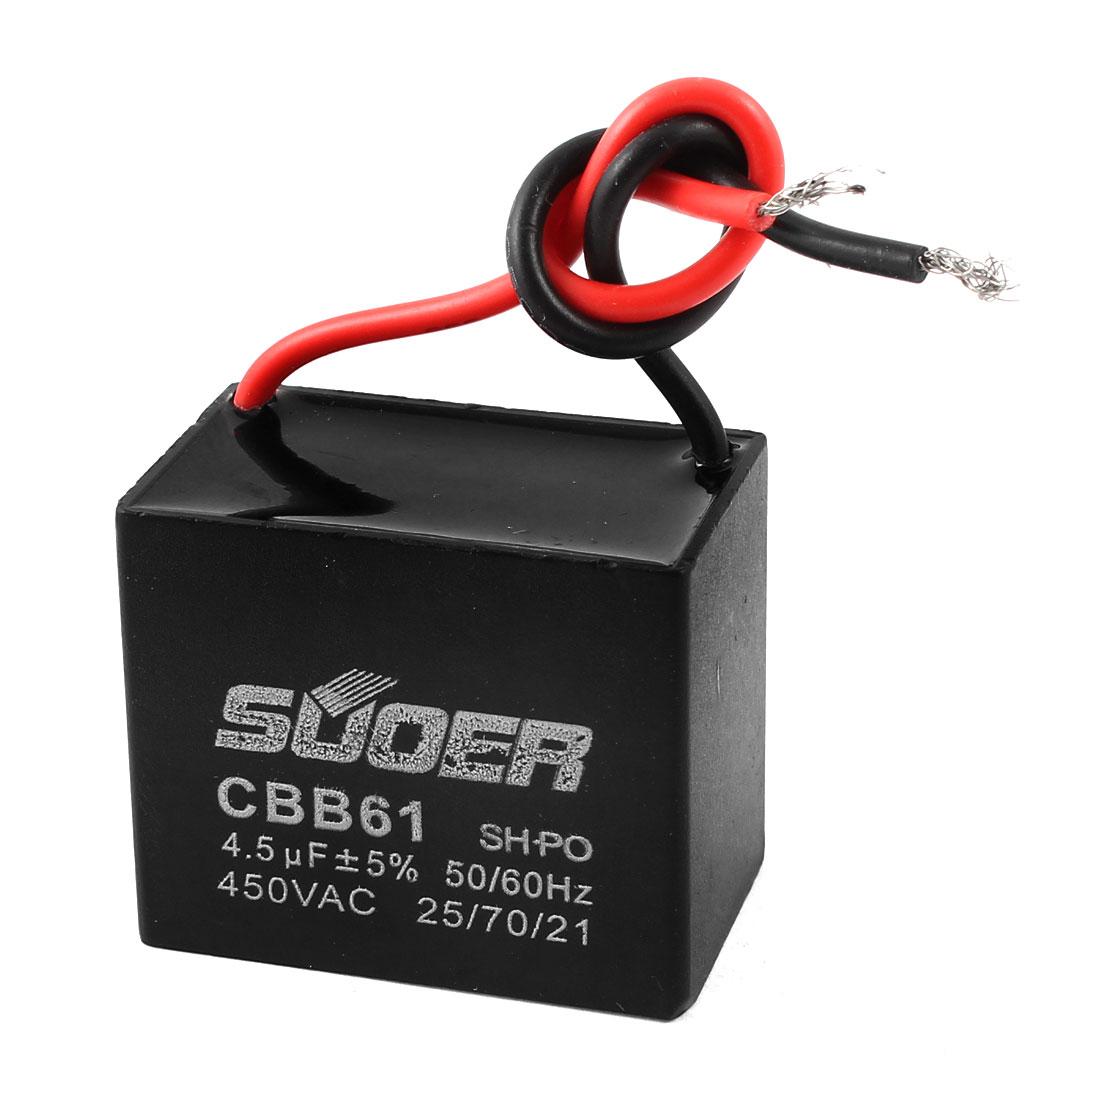 CBB61 AC 450V 4.5uF 5% Polypropylene Film Motor Running Capacitor Black